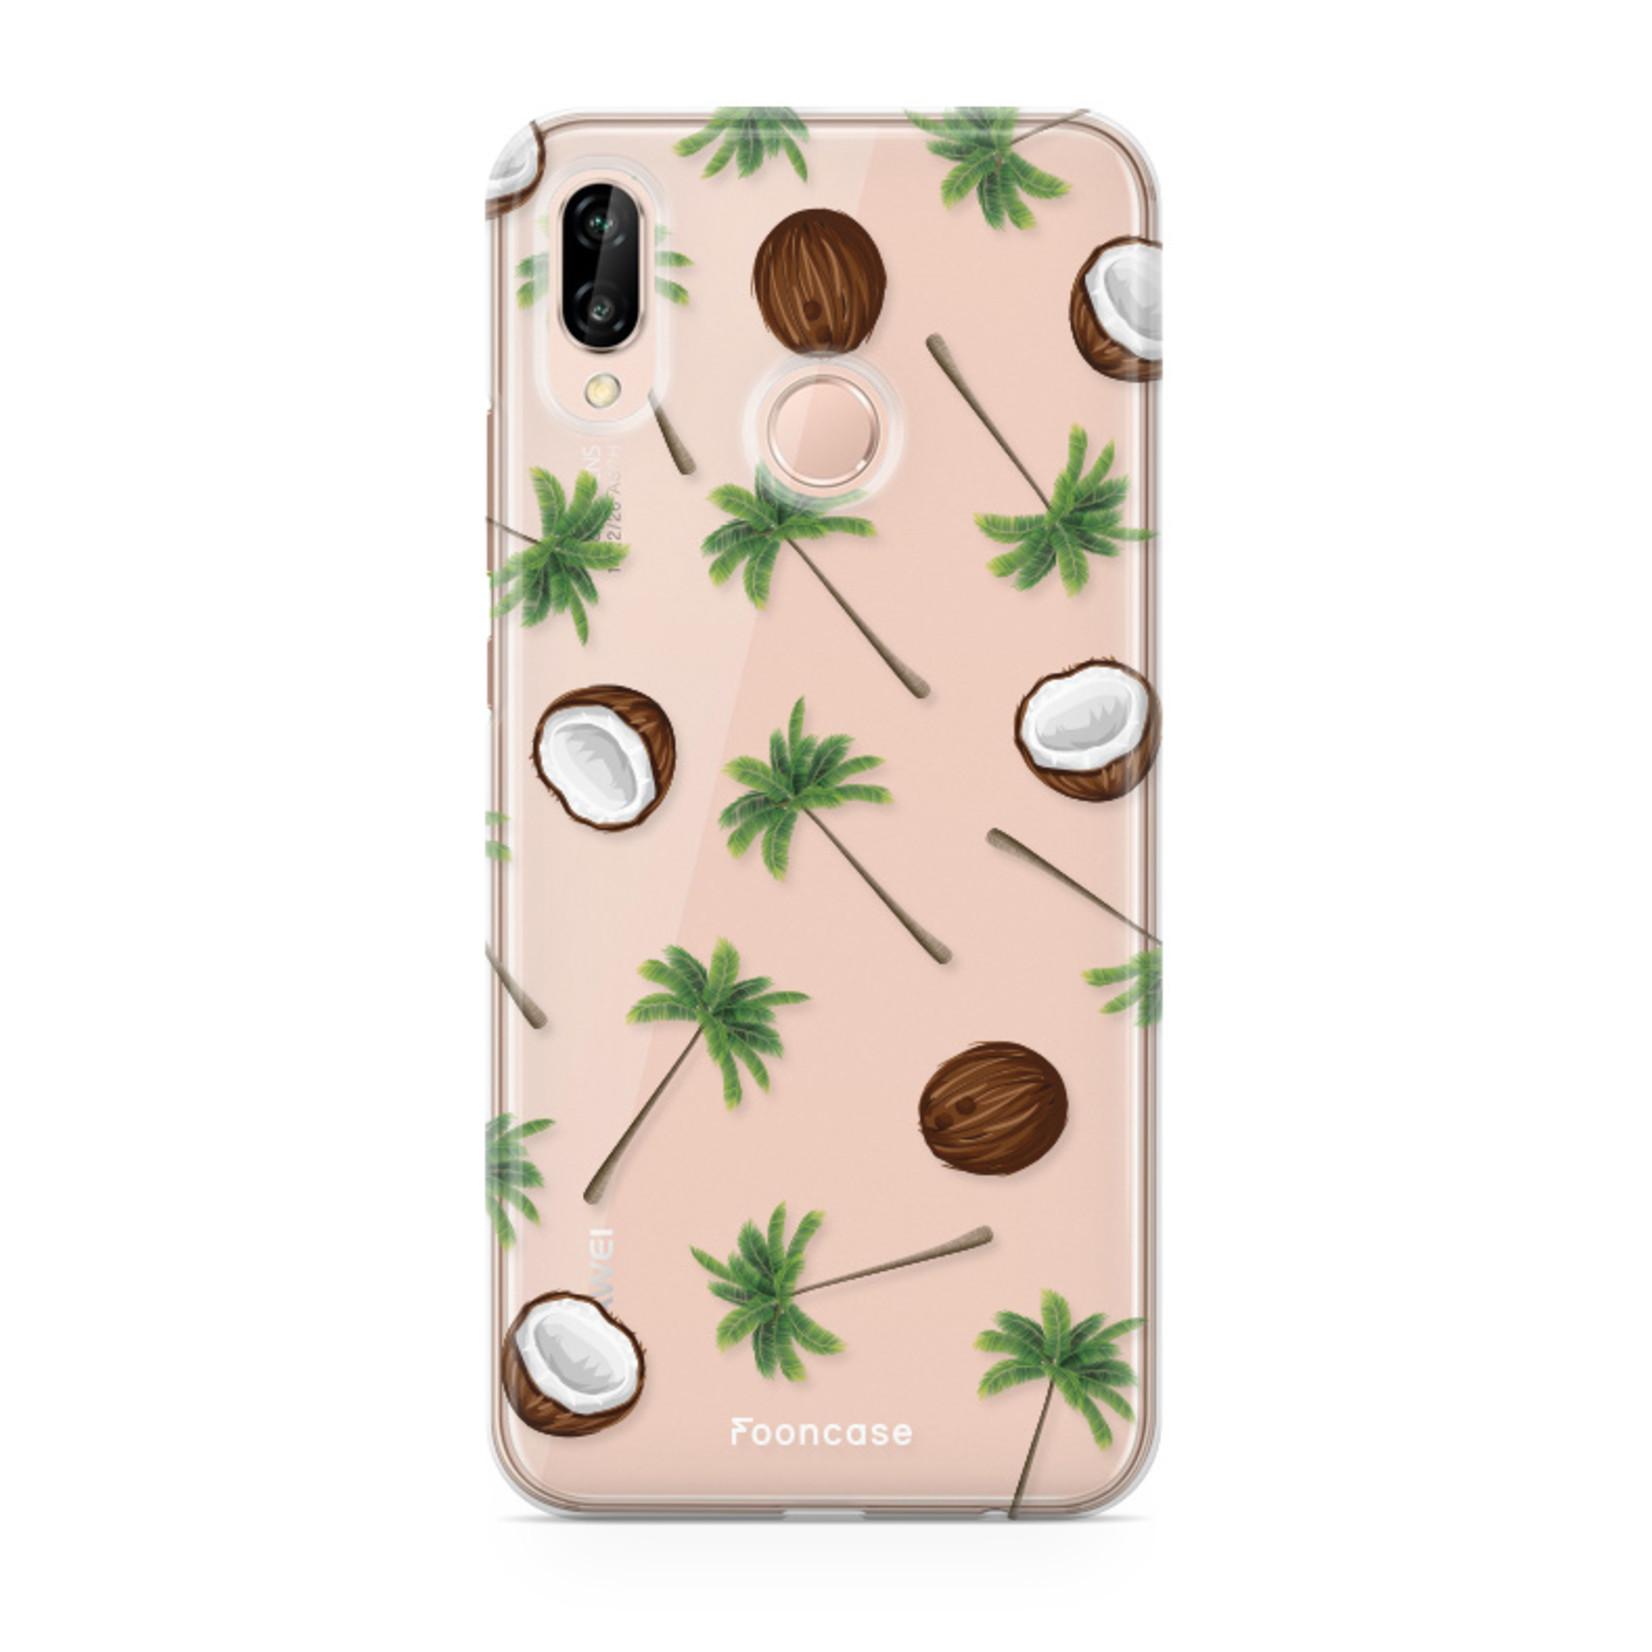 FOONCASE Huawei P20 Lite Handyhülle - Coco Paradise